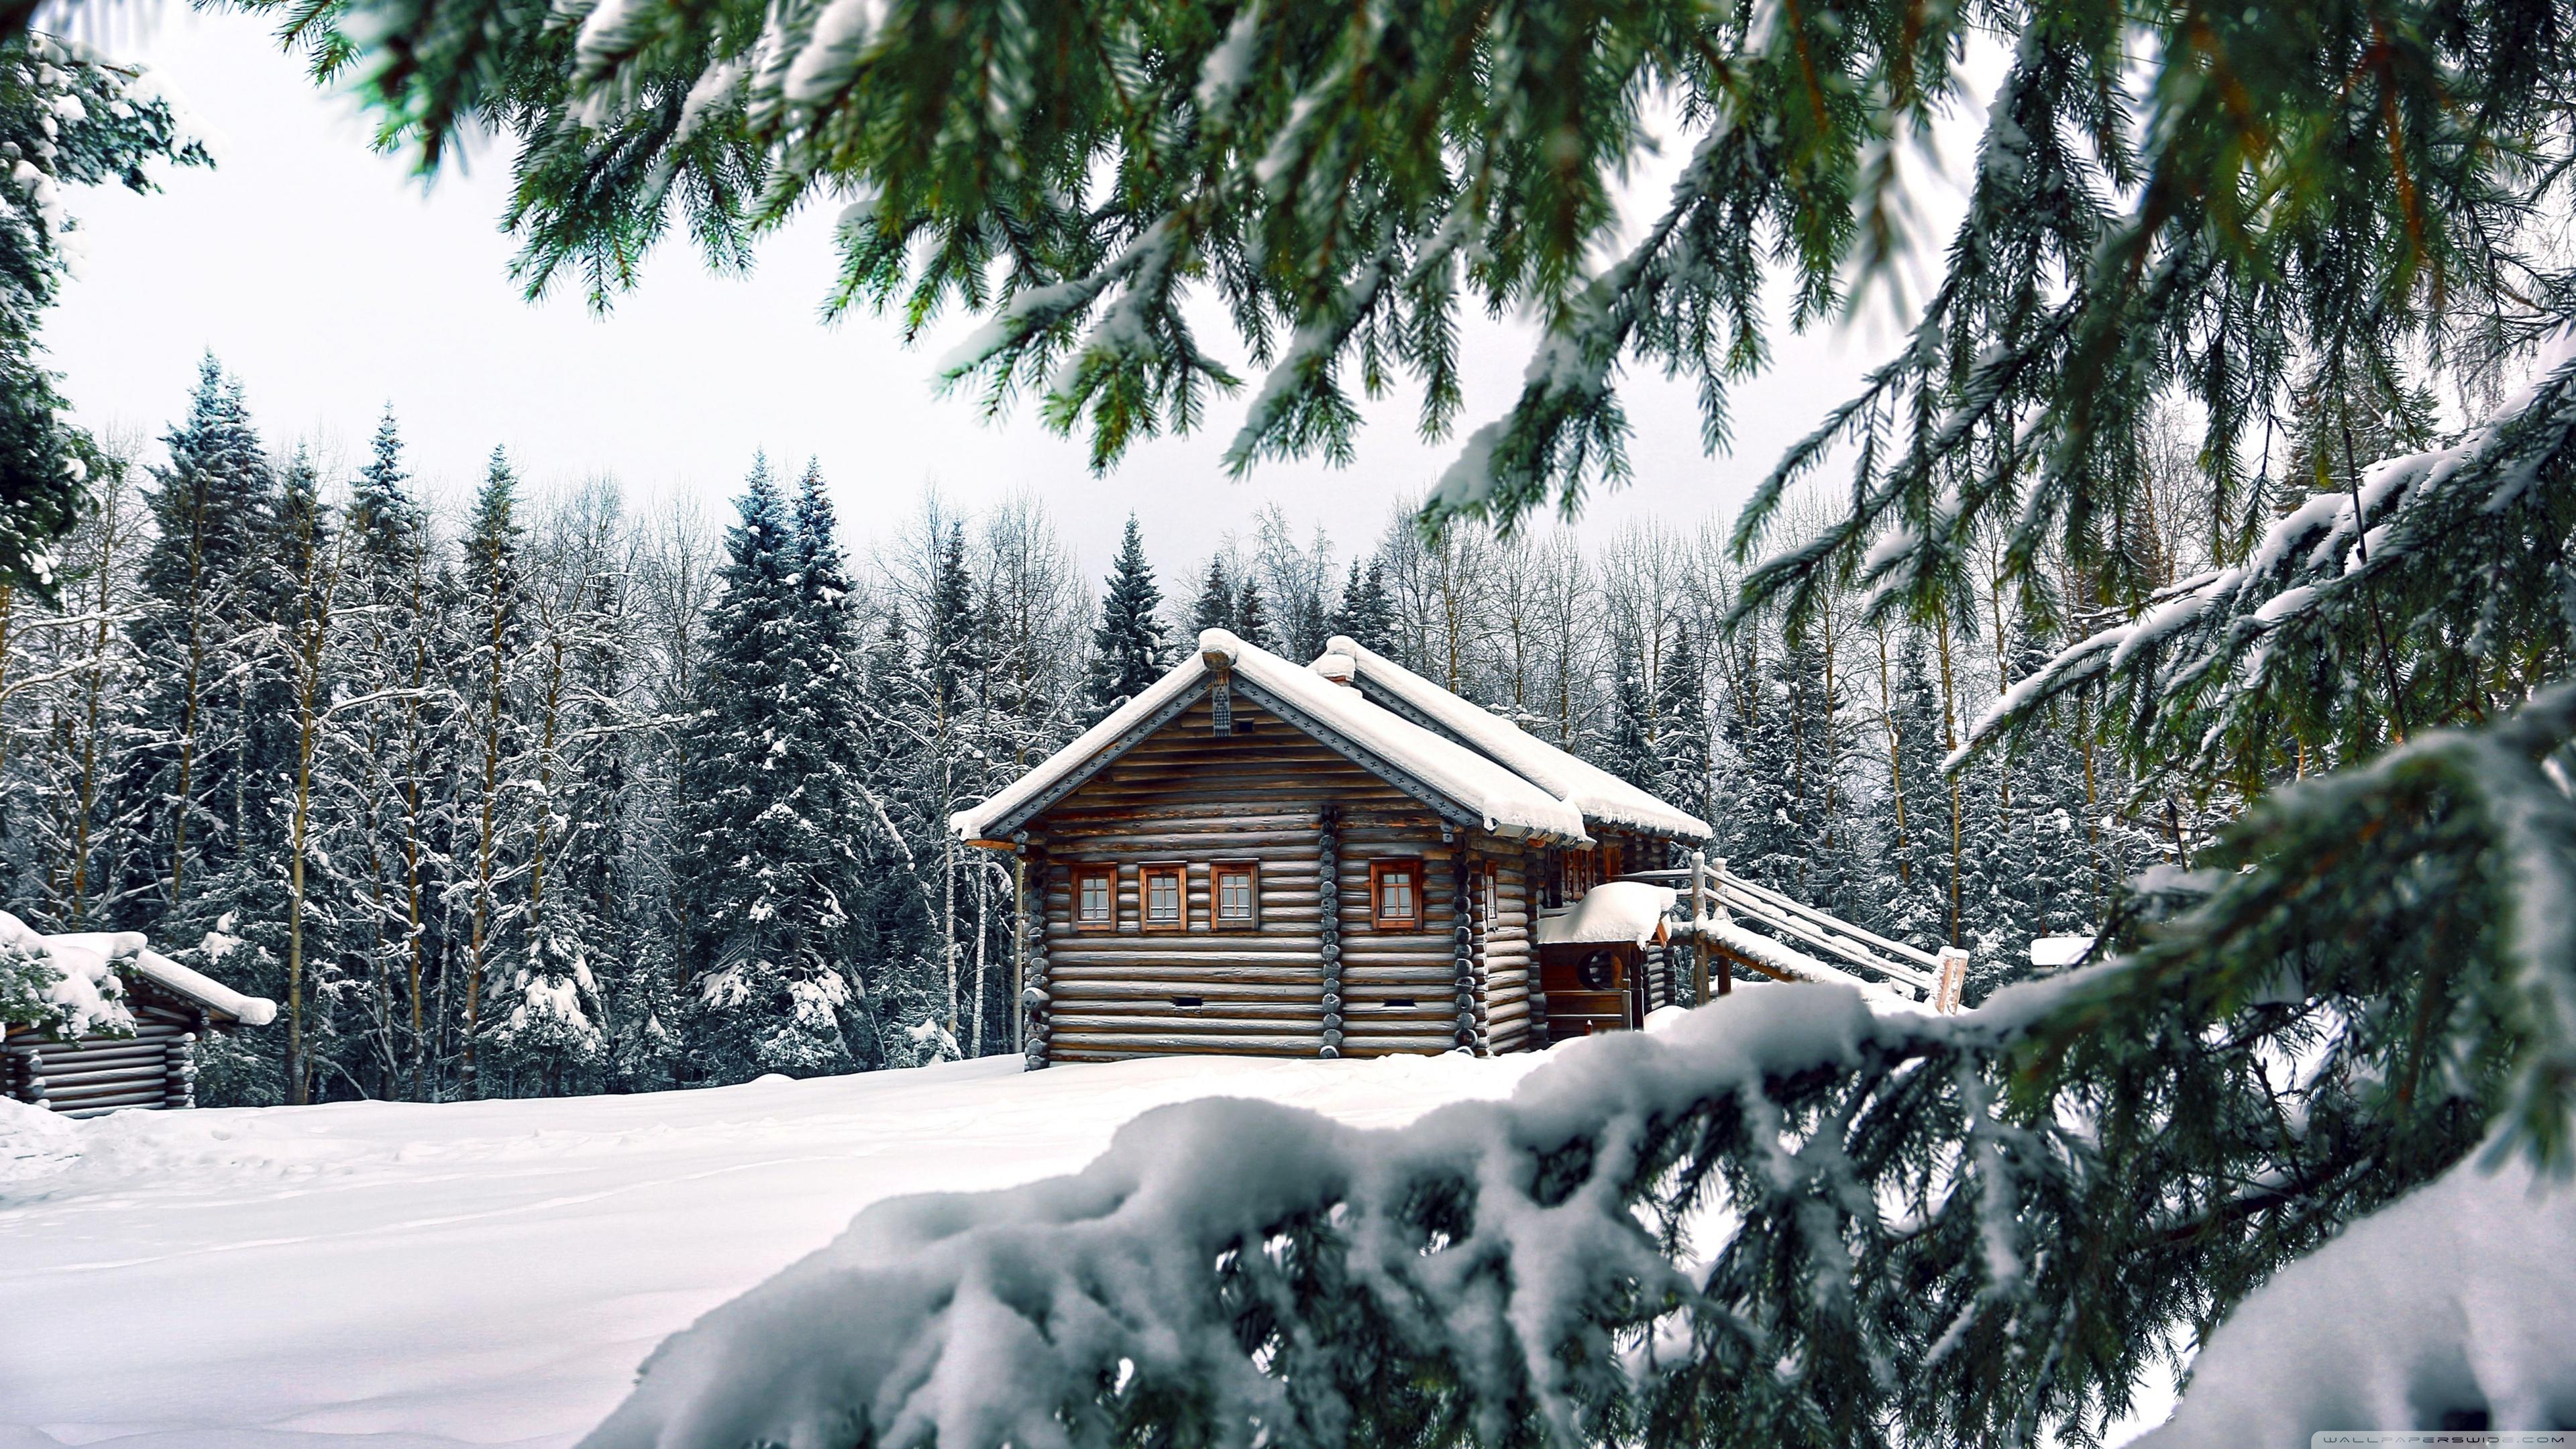 Mountain Retreat Winter Ultra HD Desktop Background Wallpaper for 3840x2160